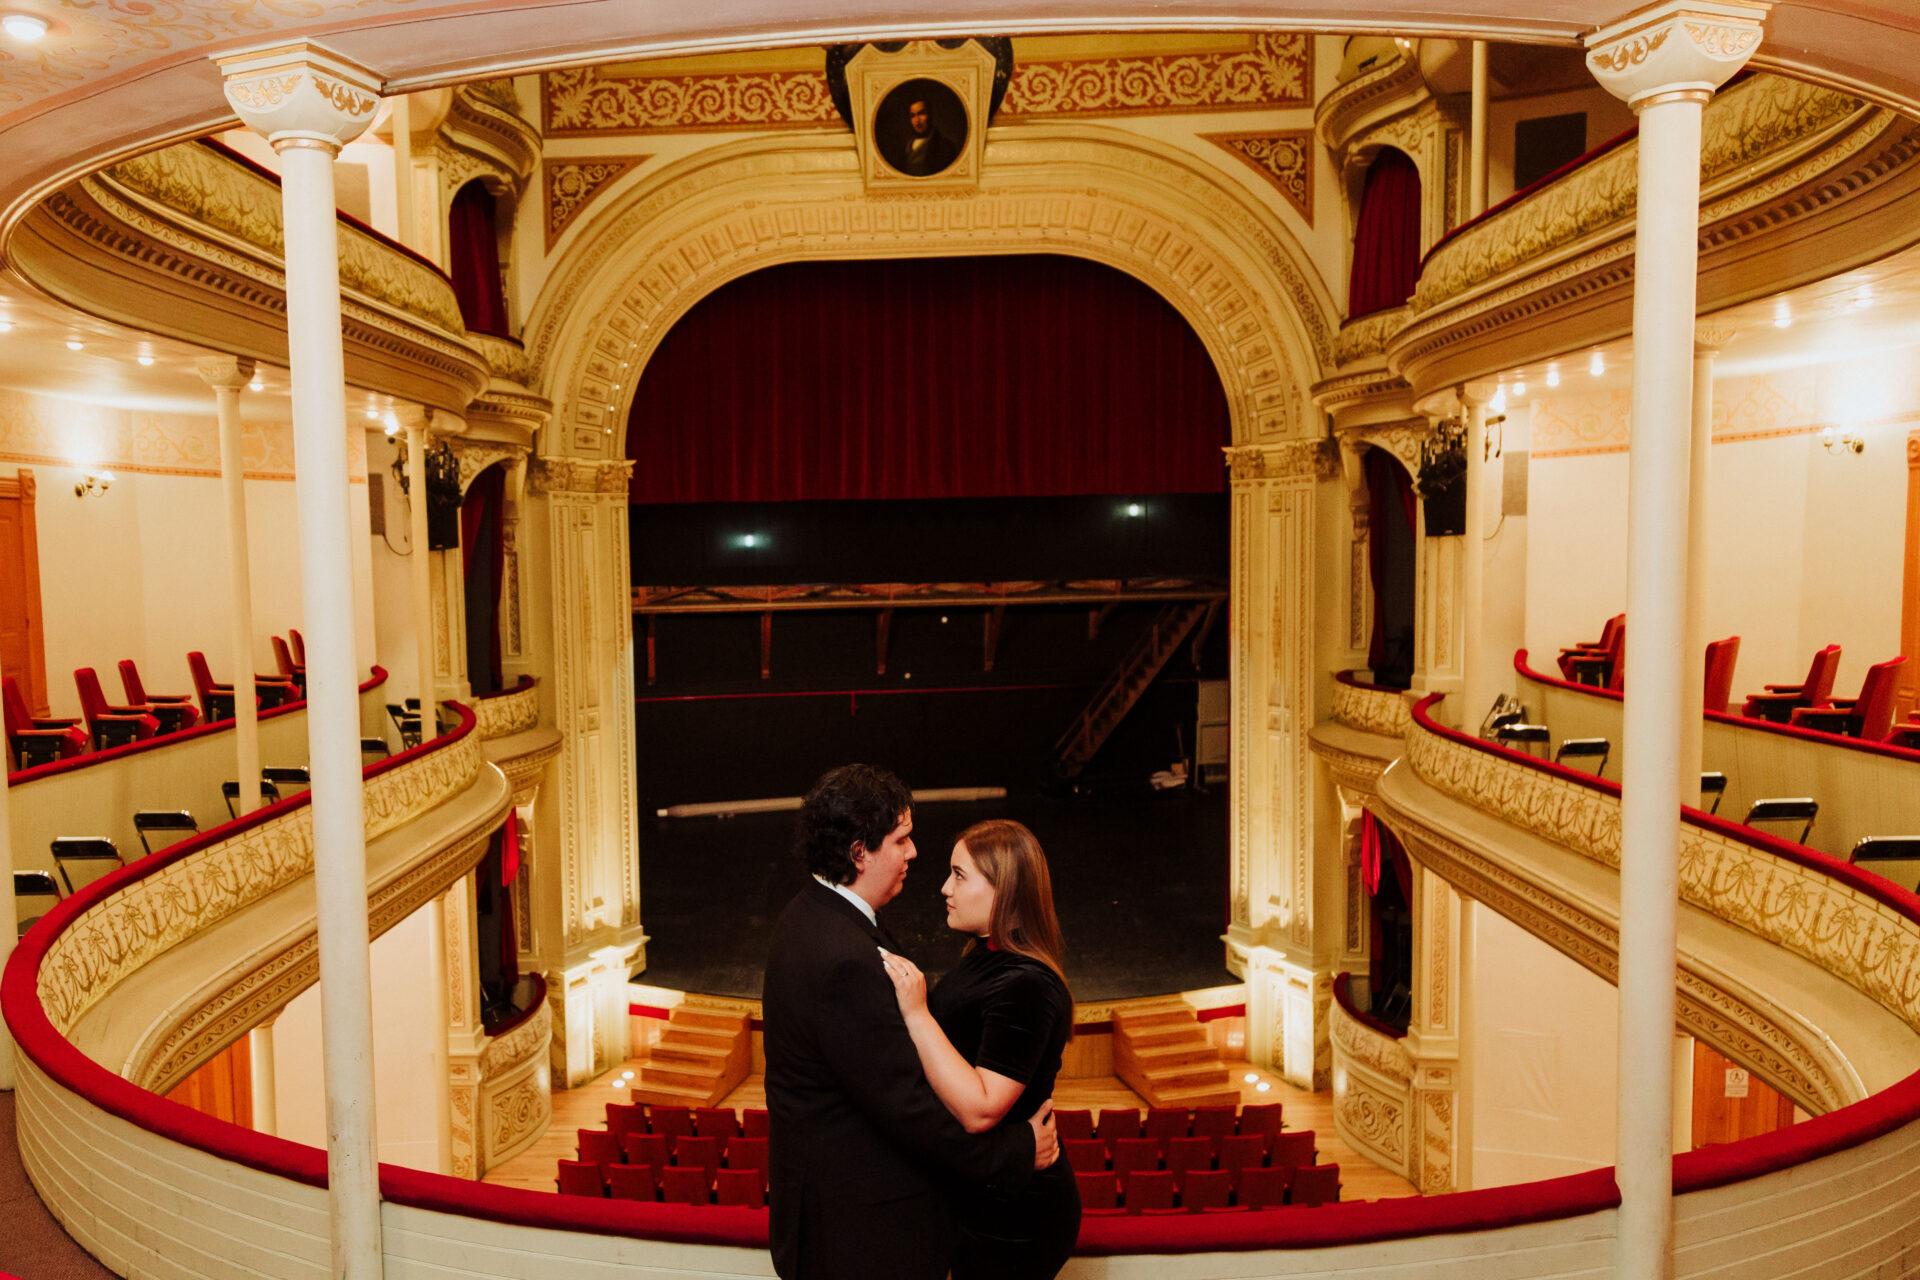 javier_noriega_fotografo_save_the_date_zacatecas_wedding_photographer11